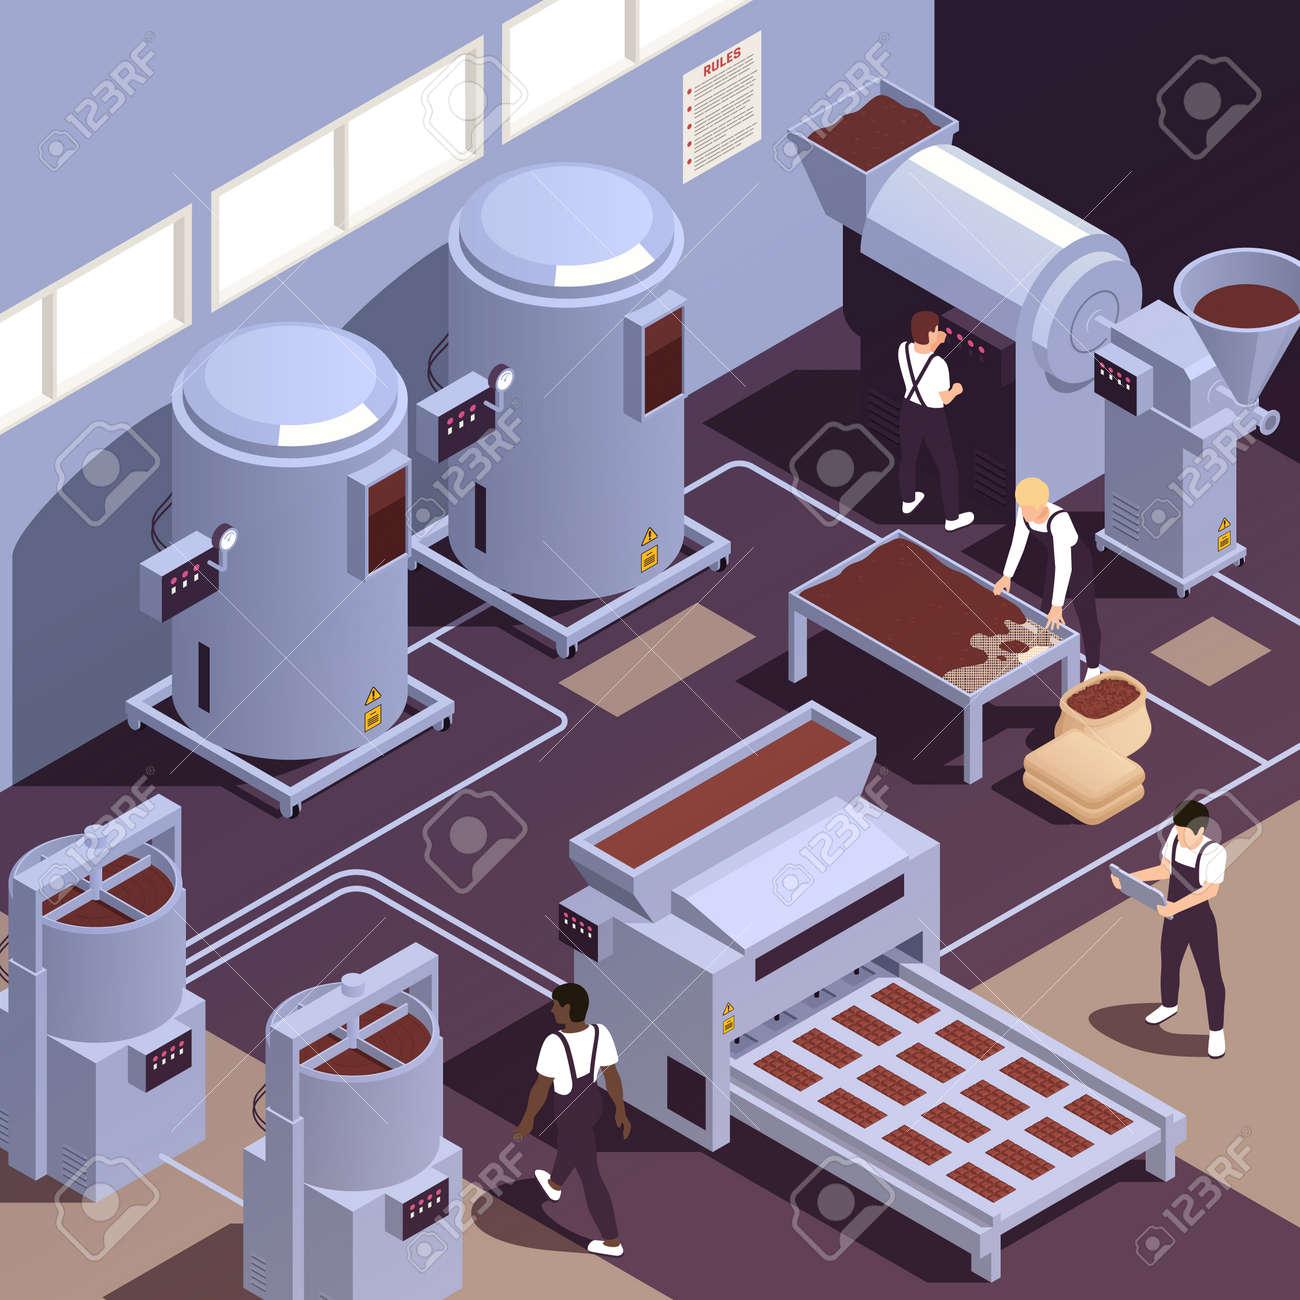 Chocolate Production Facility Isometric - 171636306